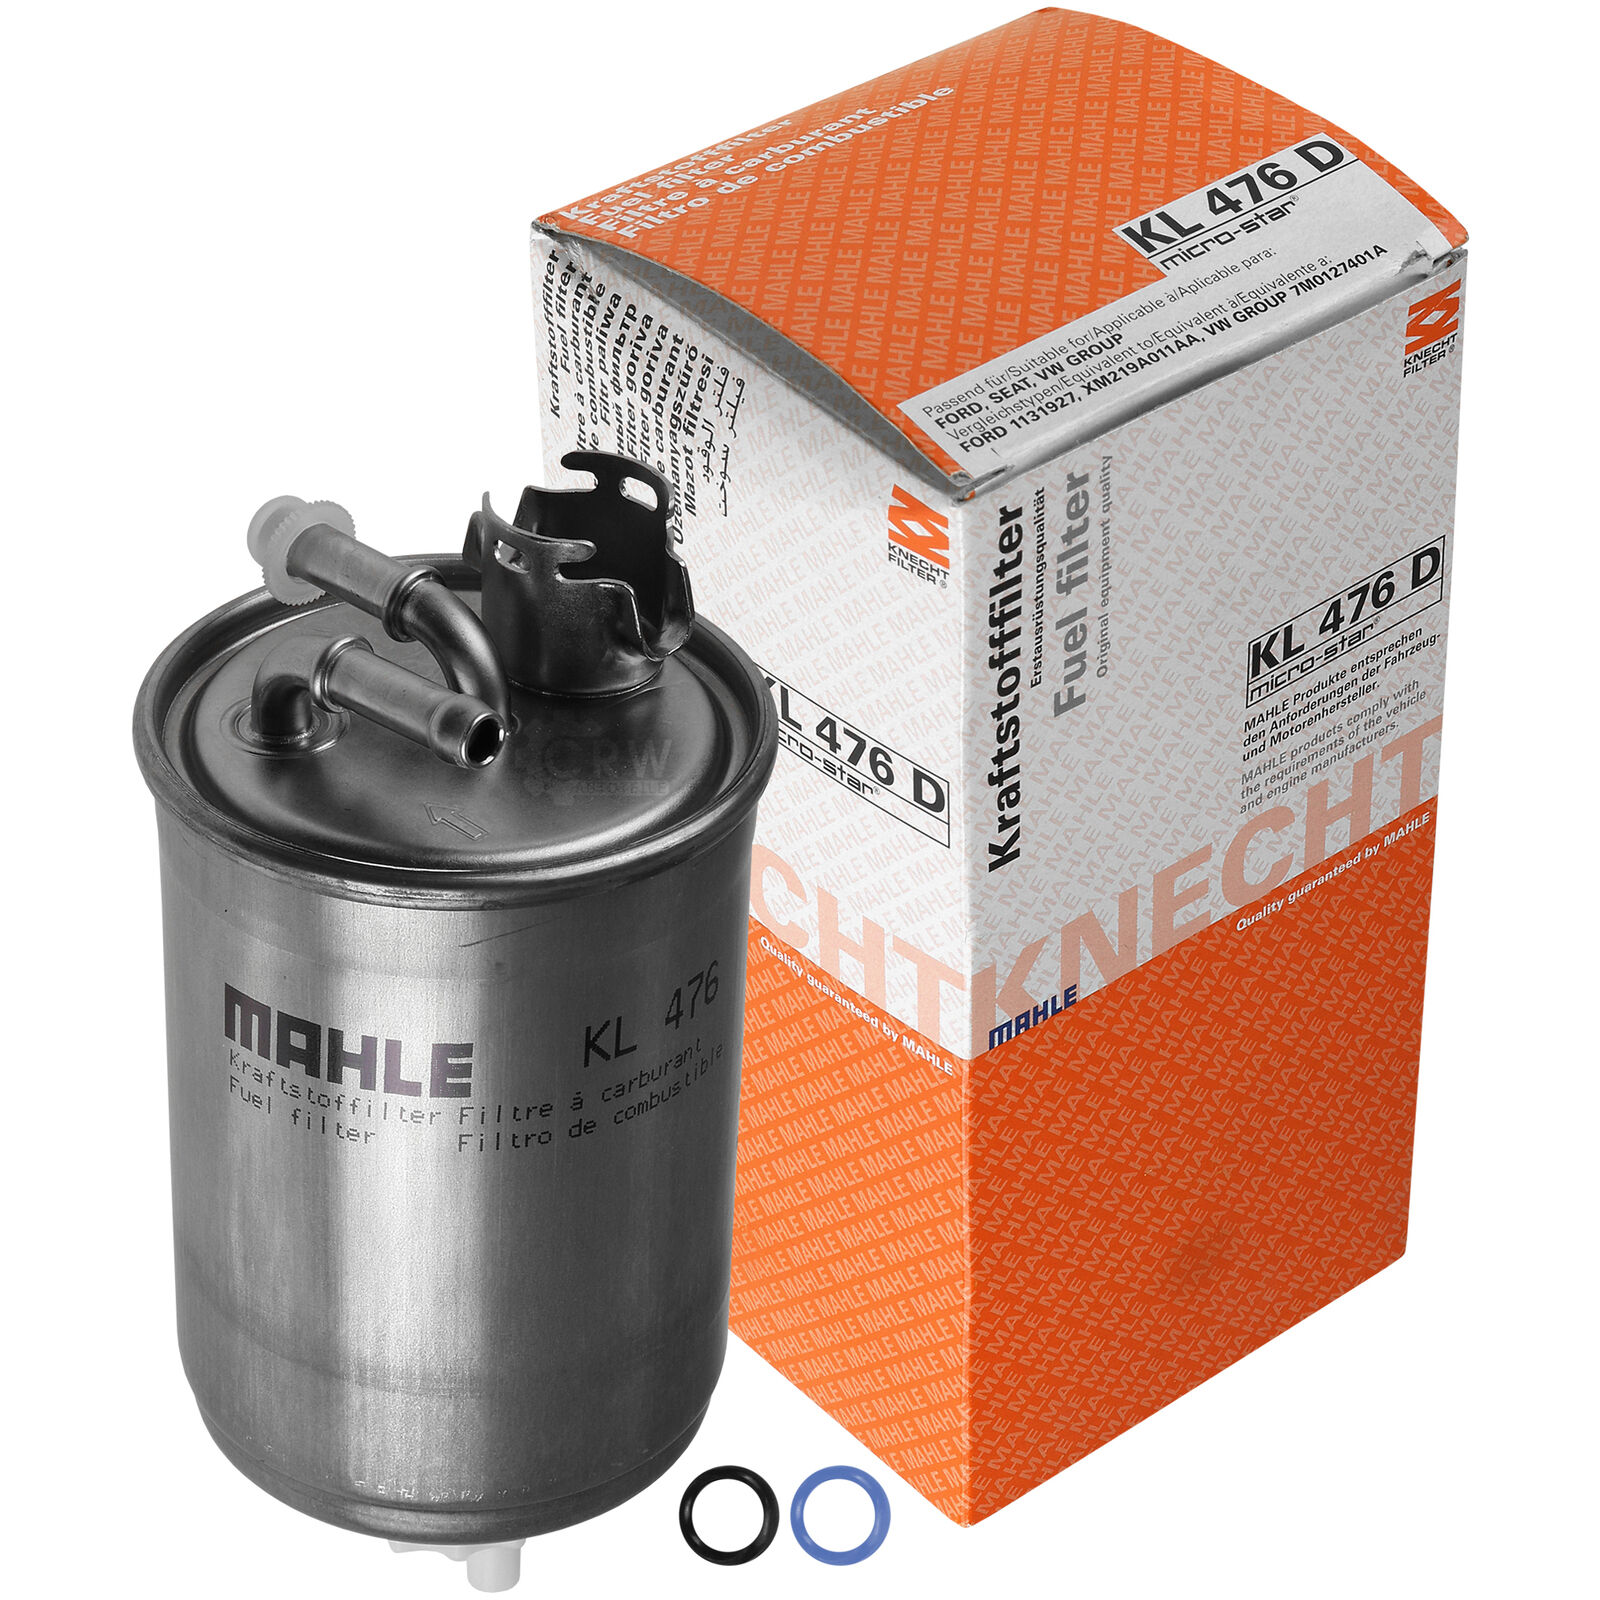 KNECHT Kraftstofffilter KL 476D Luftfilter LX 1000 Ölfilter OX 143D MAHLE